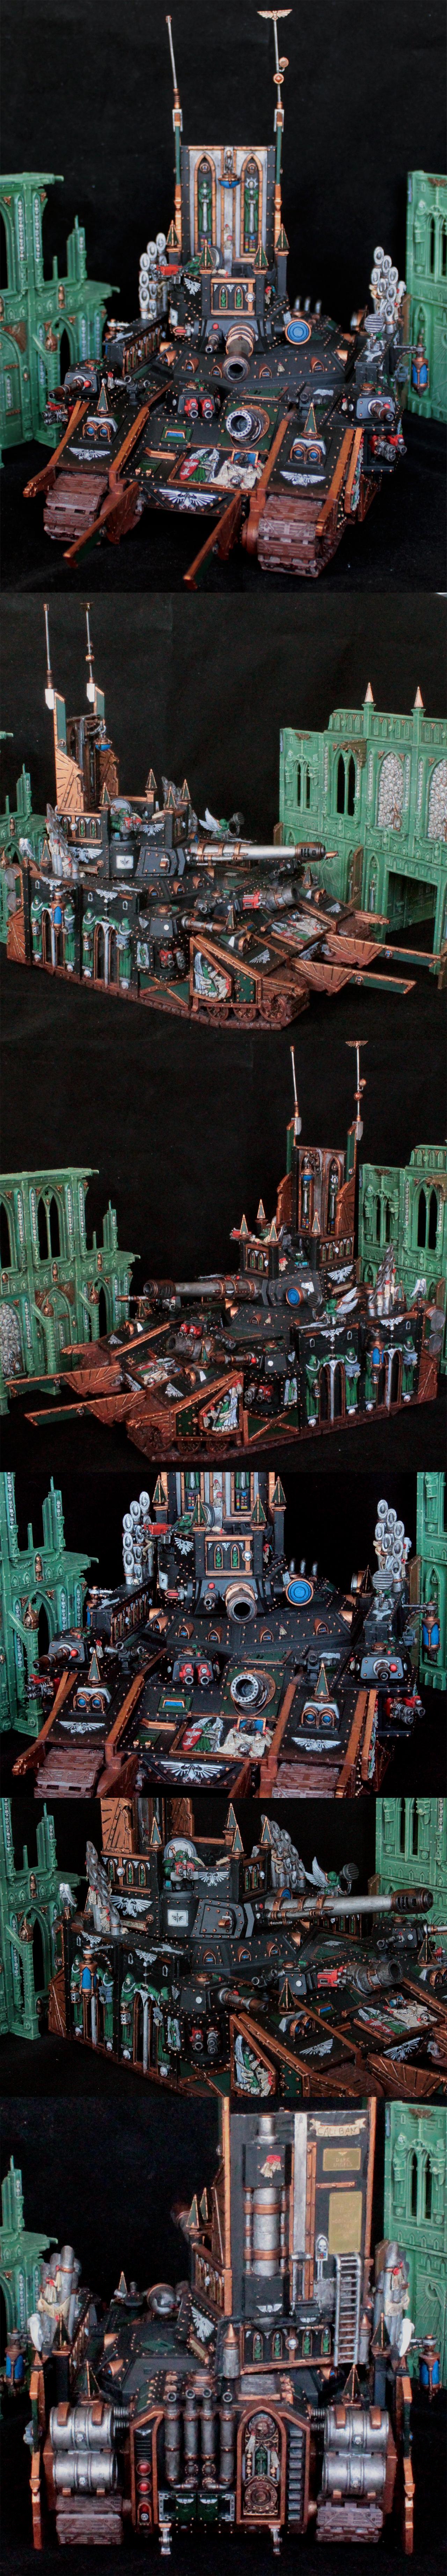 Angel, Arkaal, Baneblade, Dark, Space, Space Marines, Super-heavy, Warhammer 40,000, Warhammer Fantasy